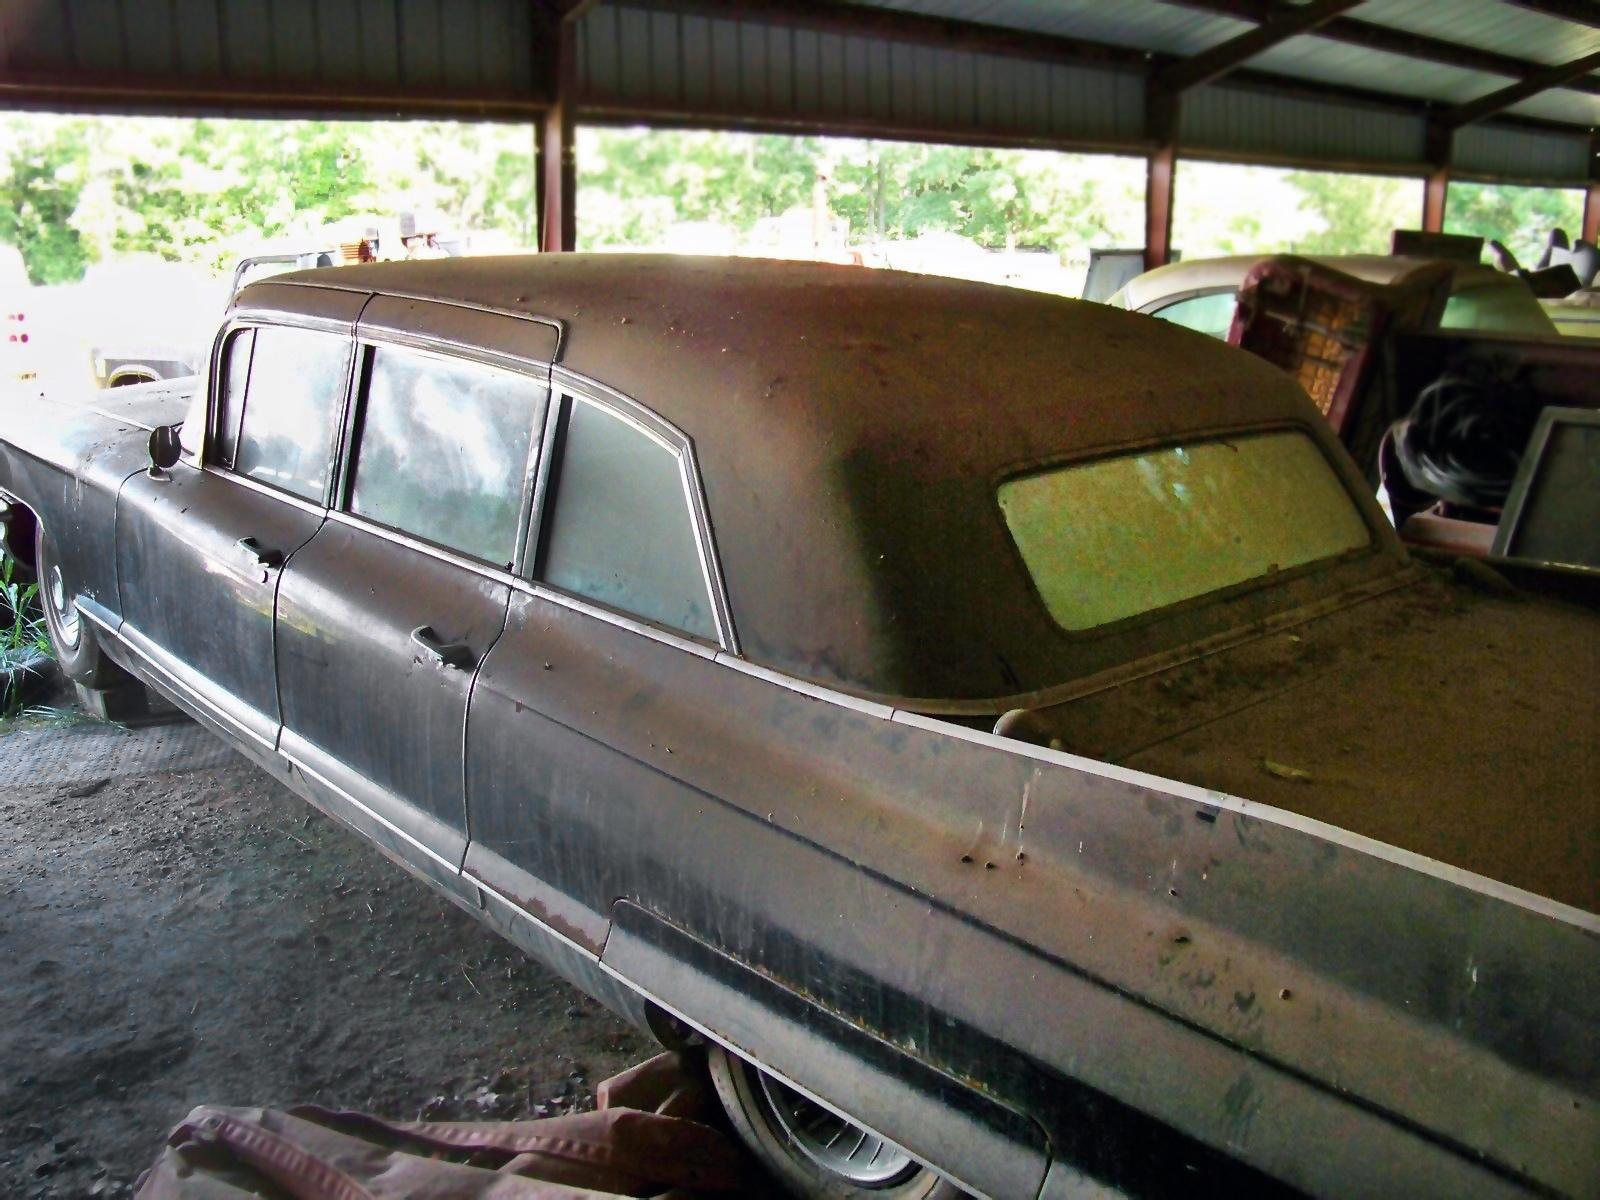 Kentucky Limo 1961 Cadillac Fleetwood 75